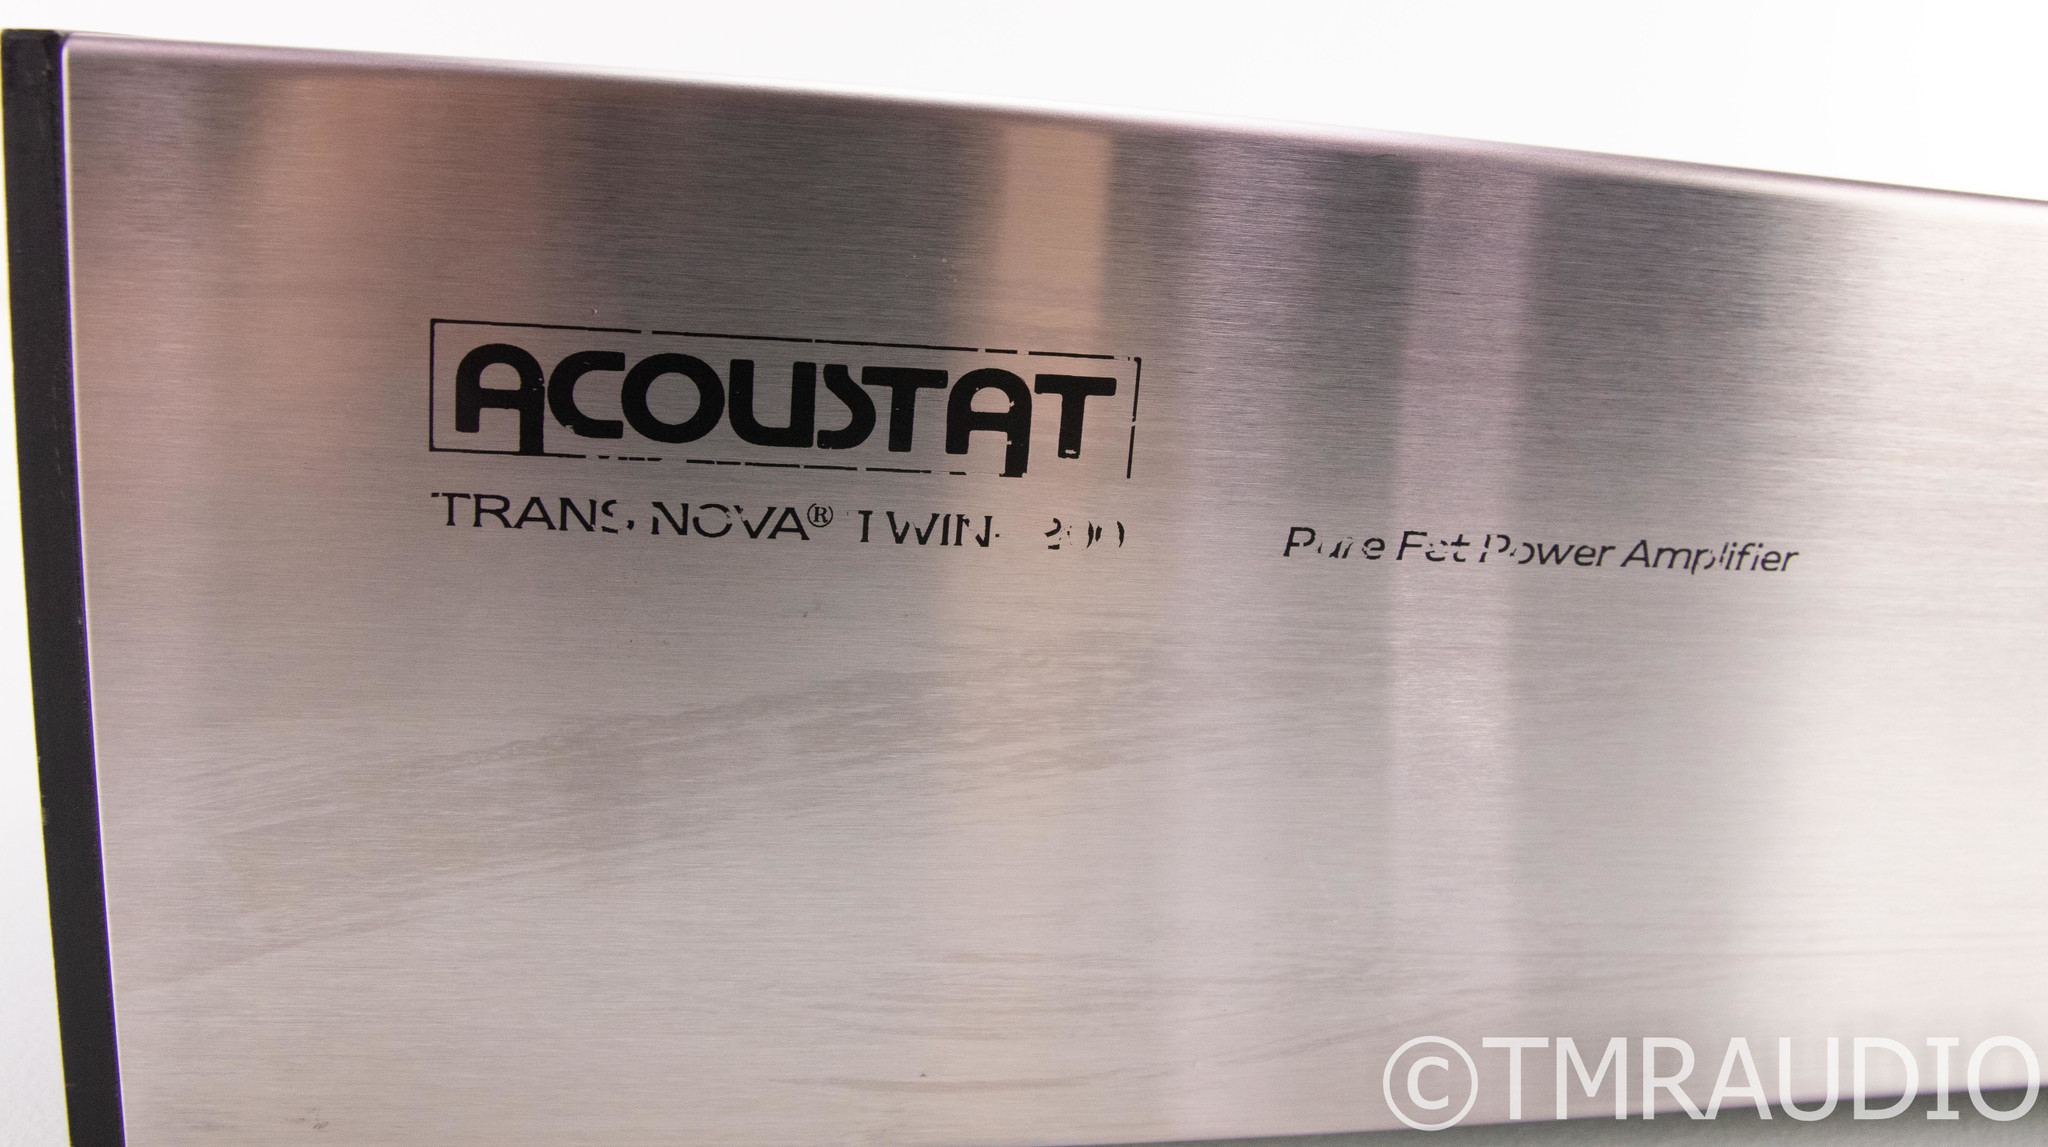 Acoustat TransNova Twin 200 Stereo Power Amplifier